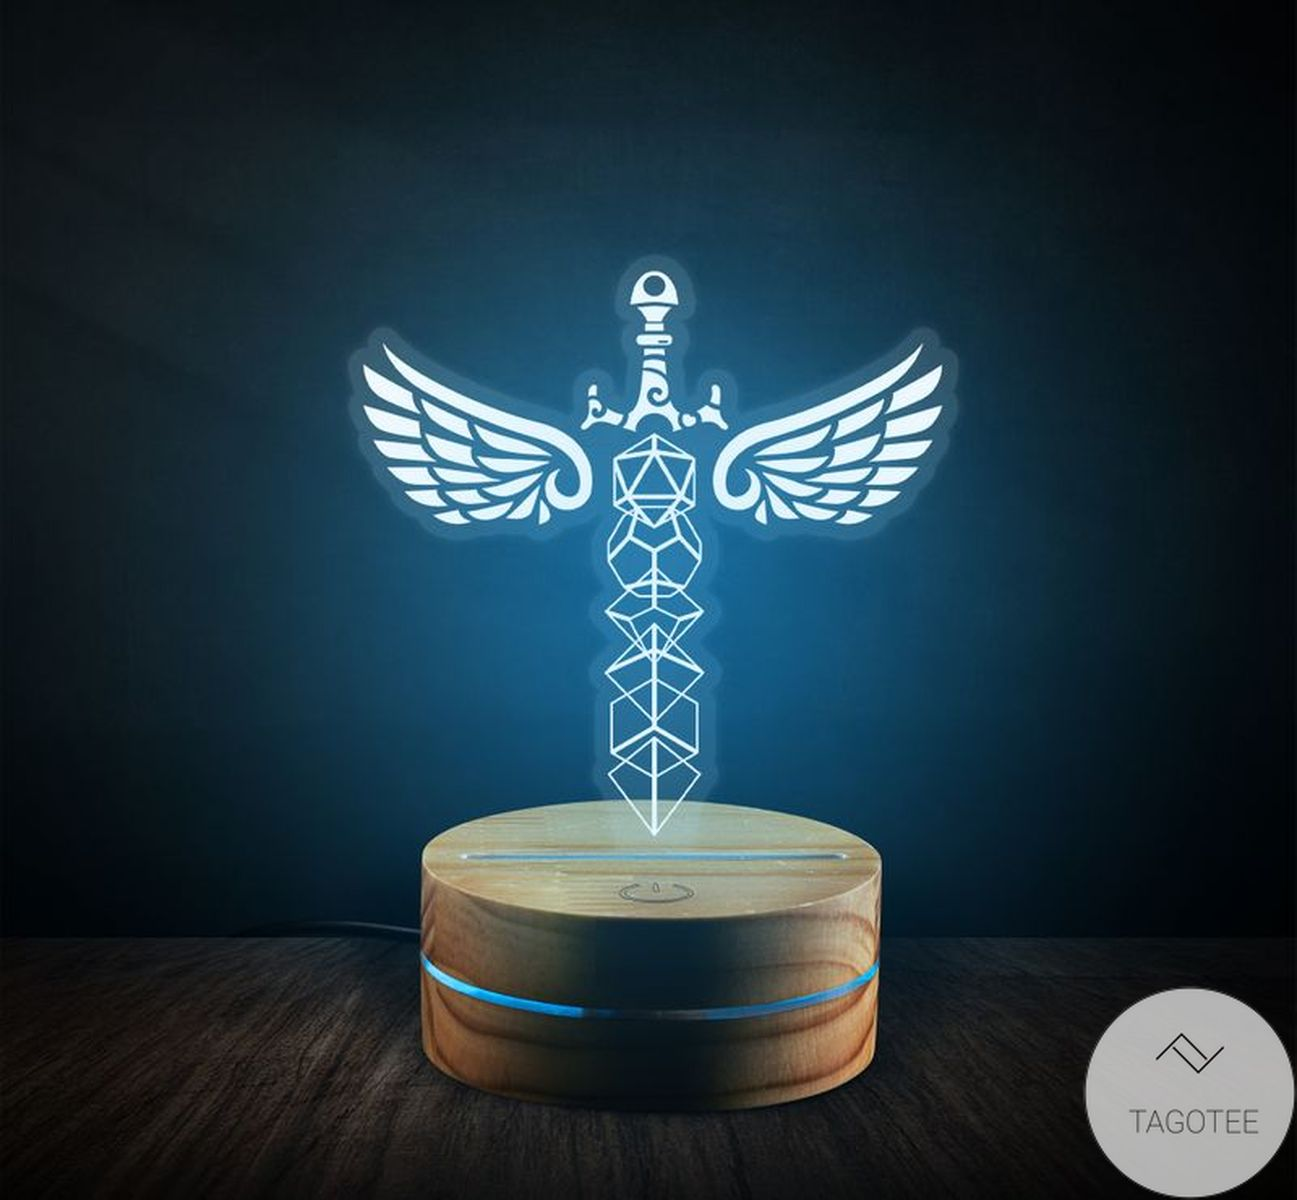 D&D Dice Sword UV LED Lamp, Night Light Lamps